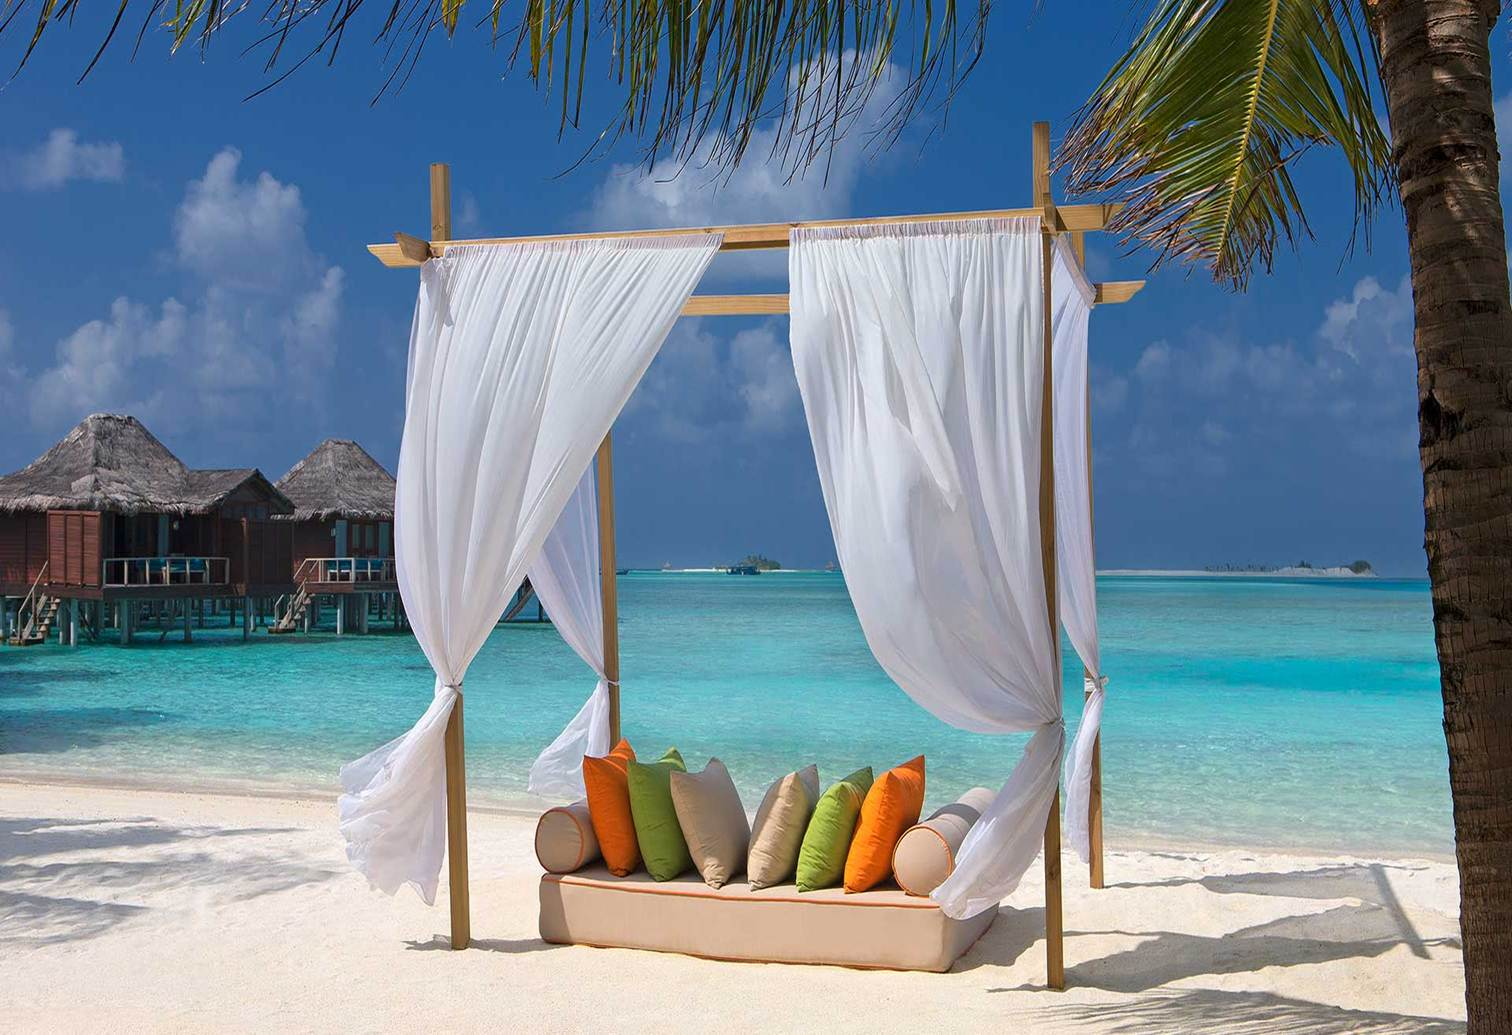 HOTEL (MALDIVAS)